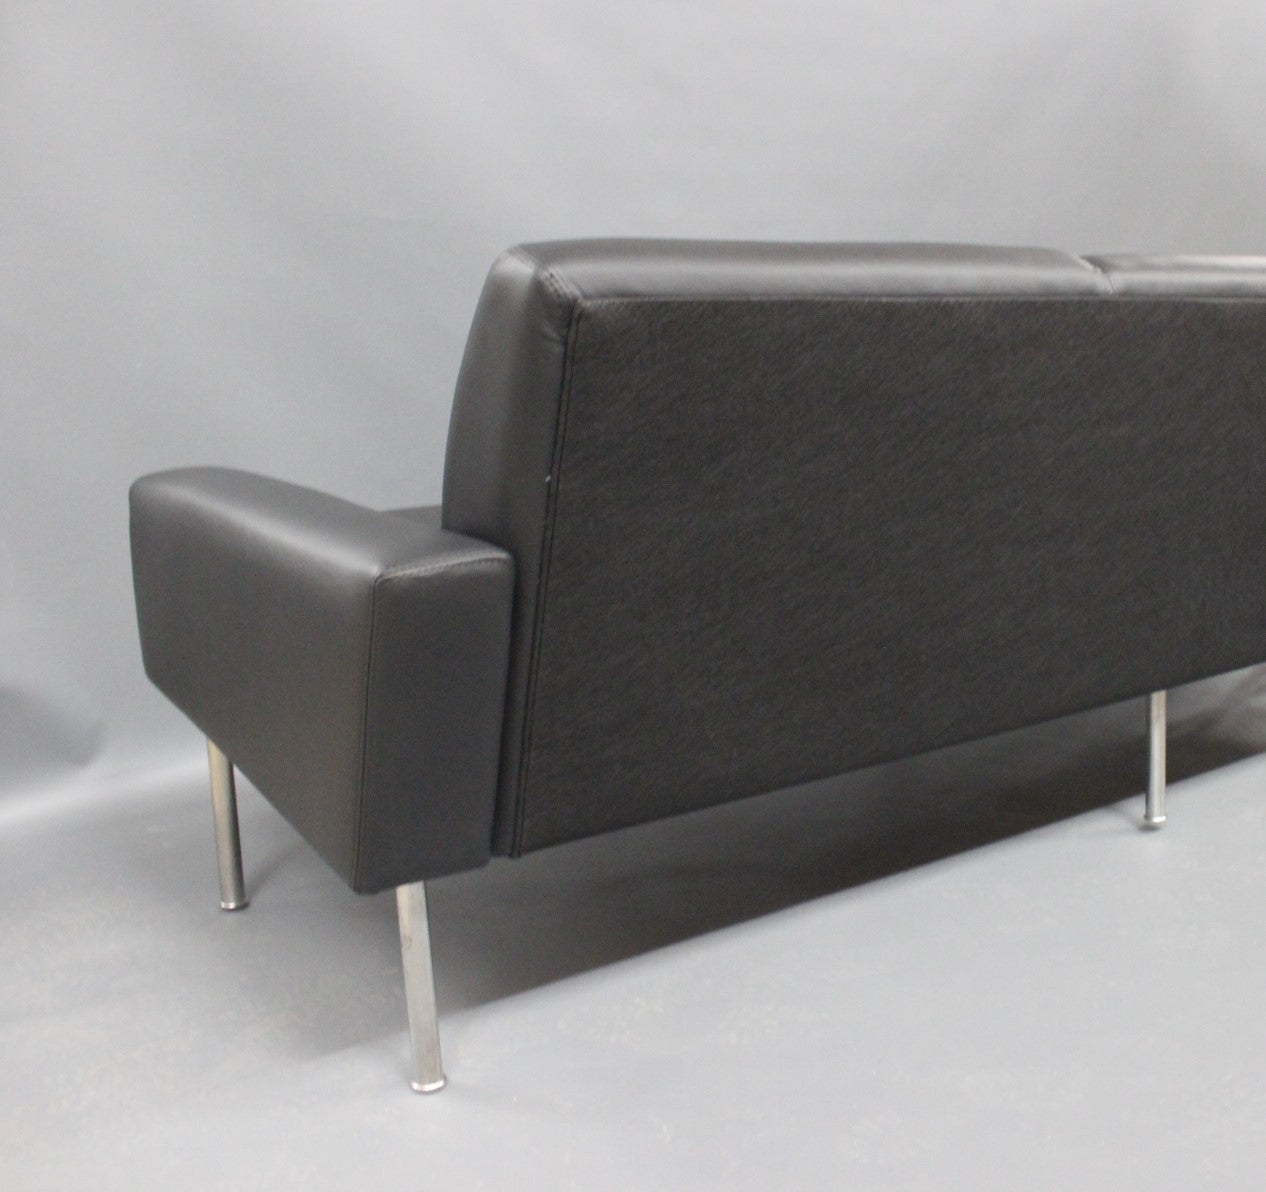 Danish Three-Seat Sofa, Model 34/3, by Hans J. Wegner in Black Savanne Leather, 1960 For Sale